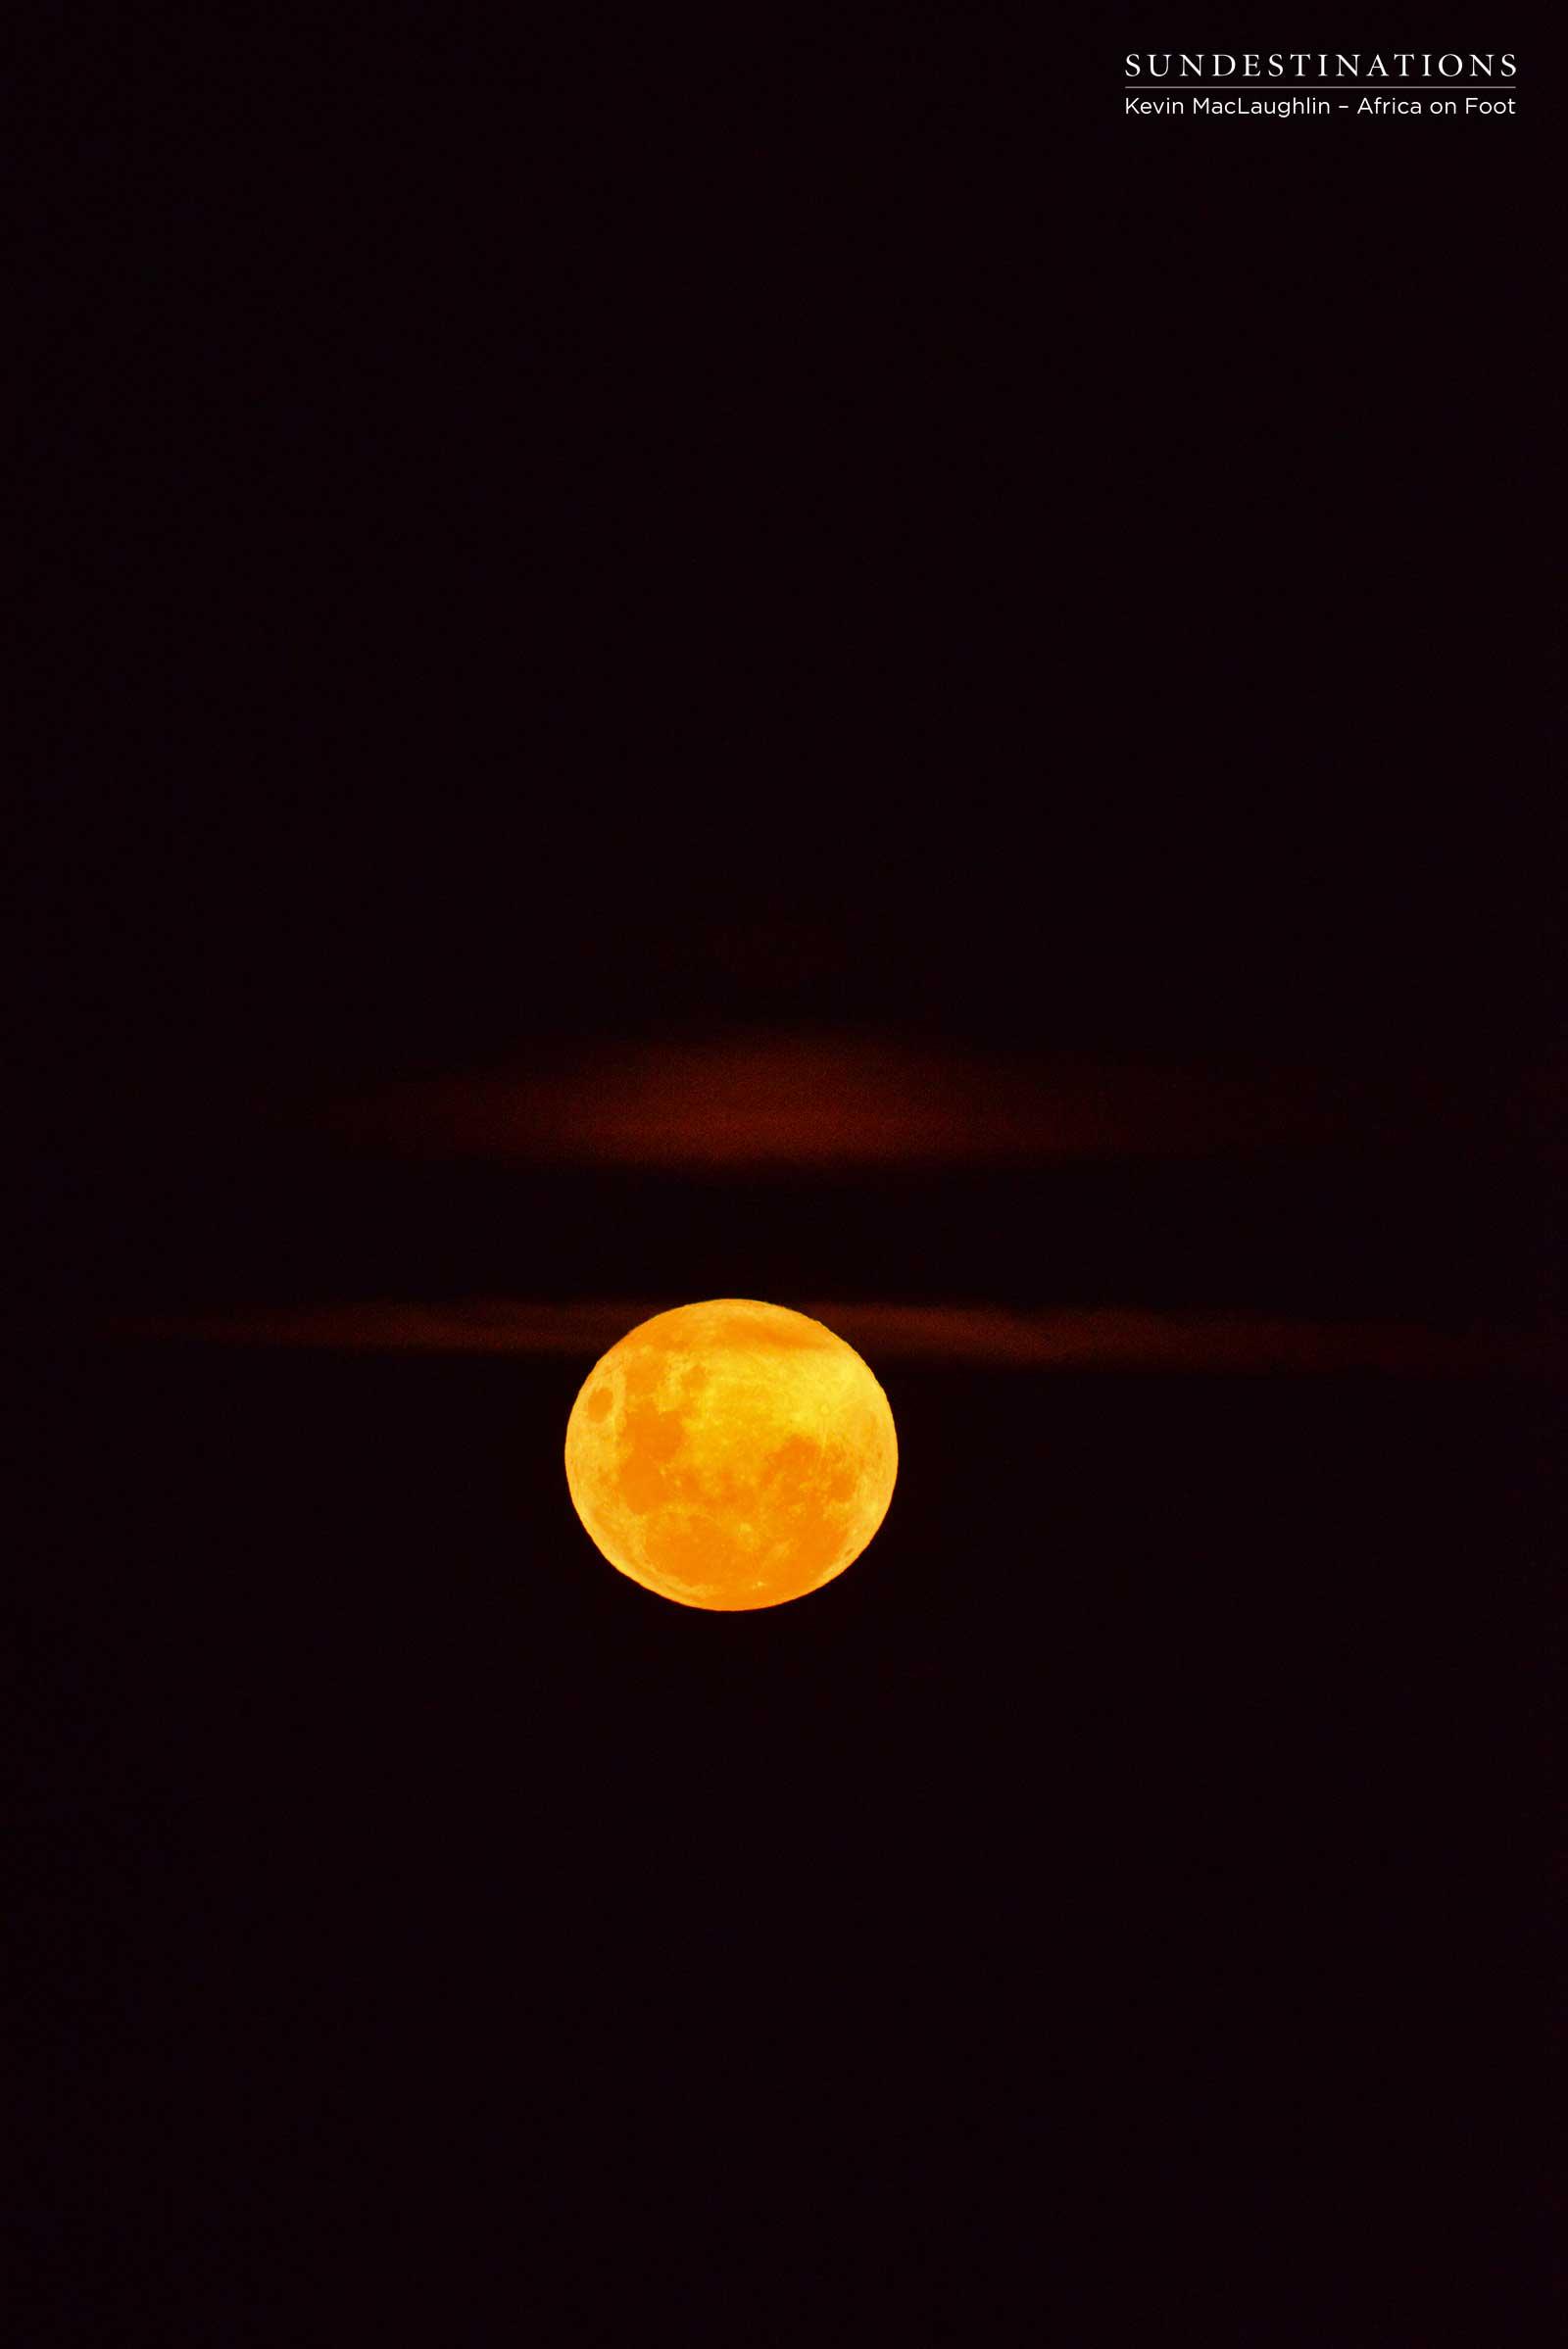 Full Moon Africa on Foot